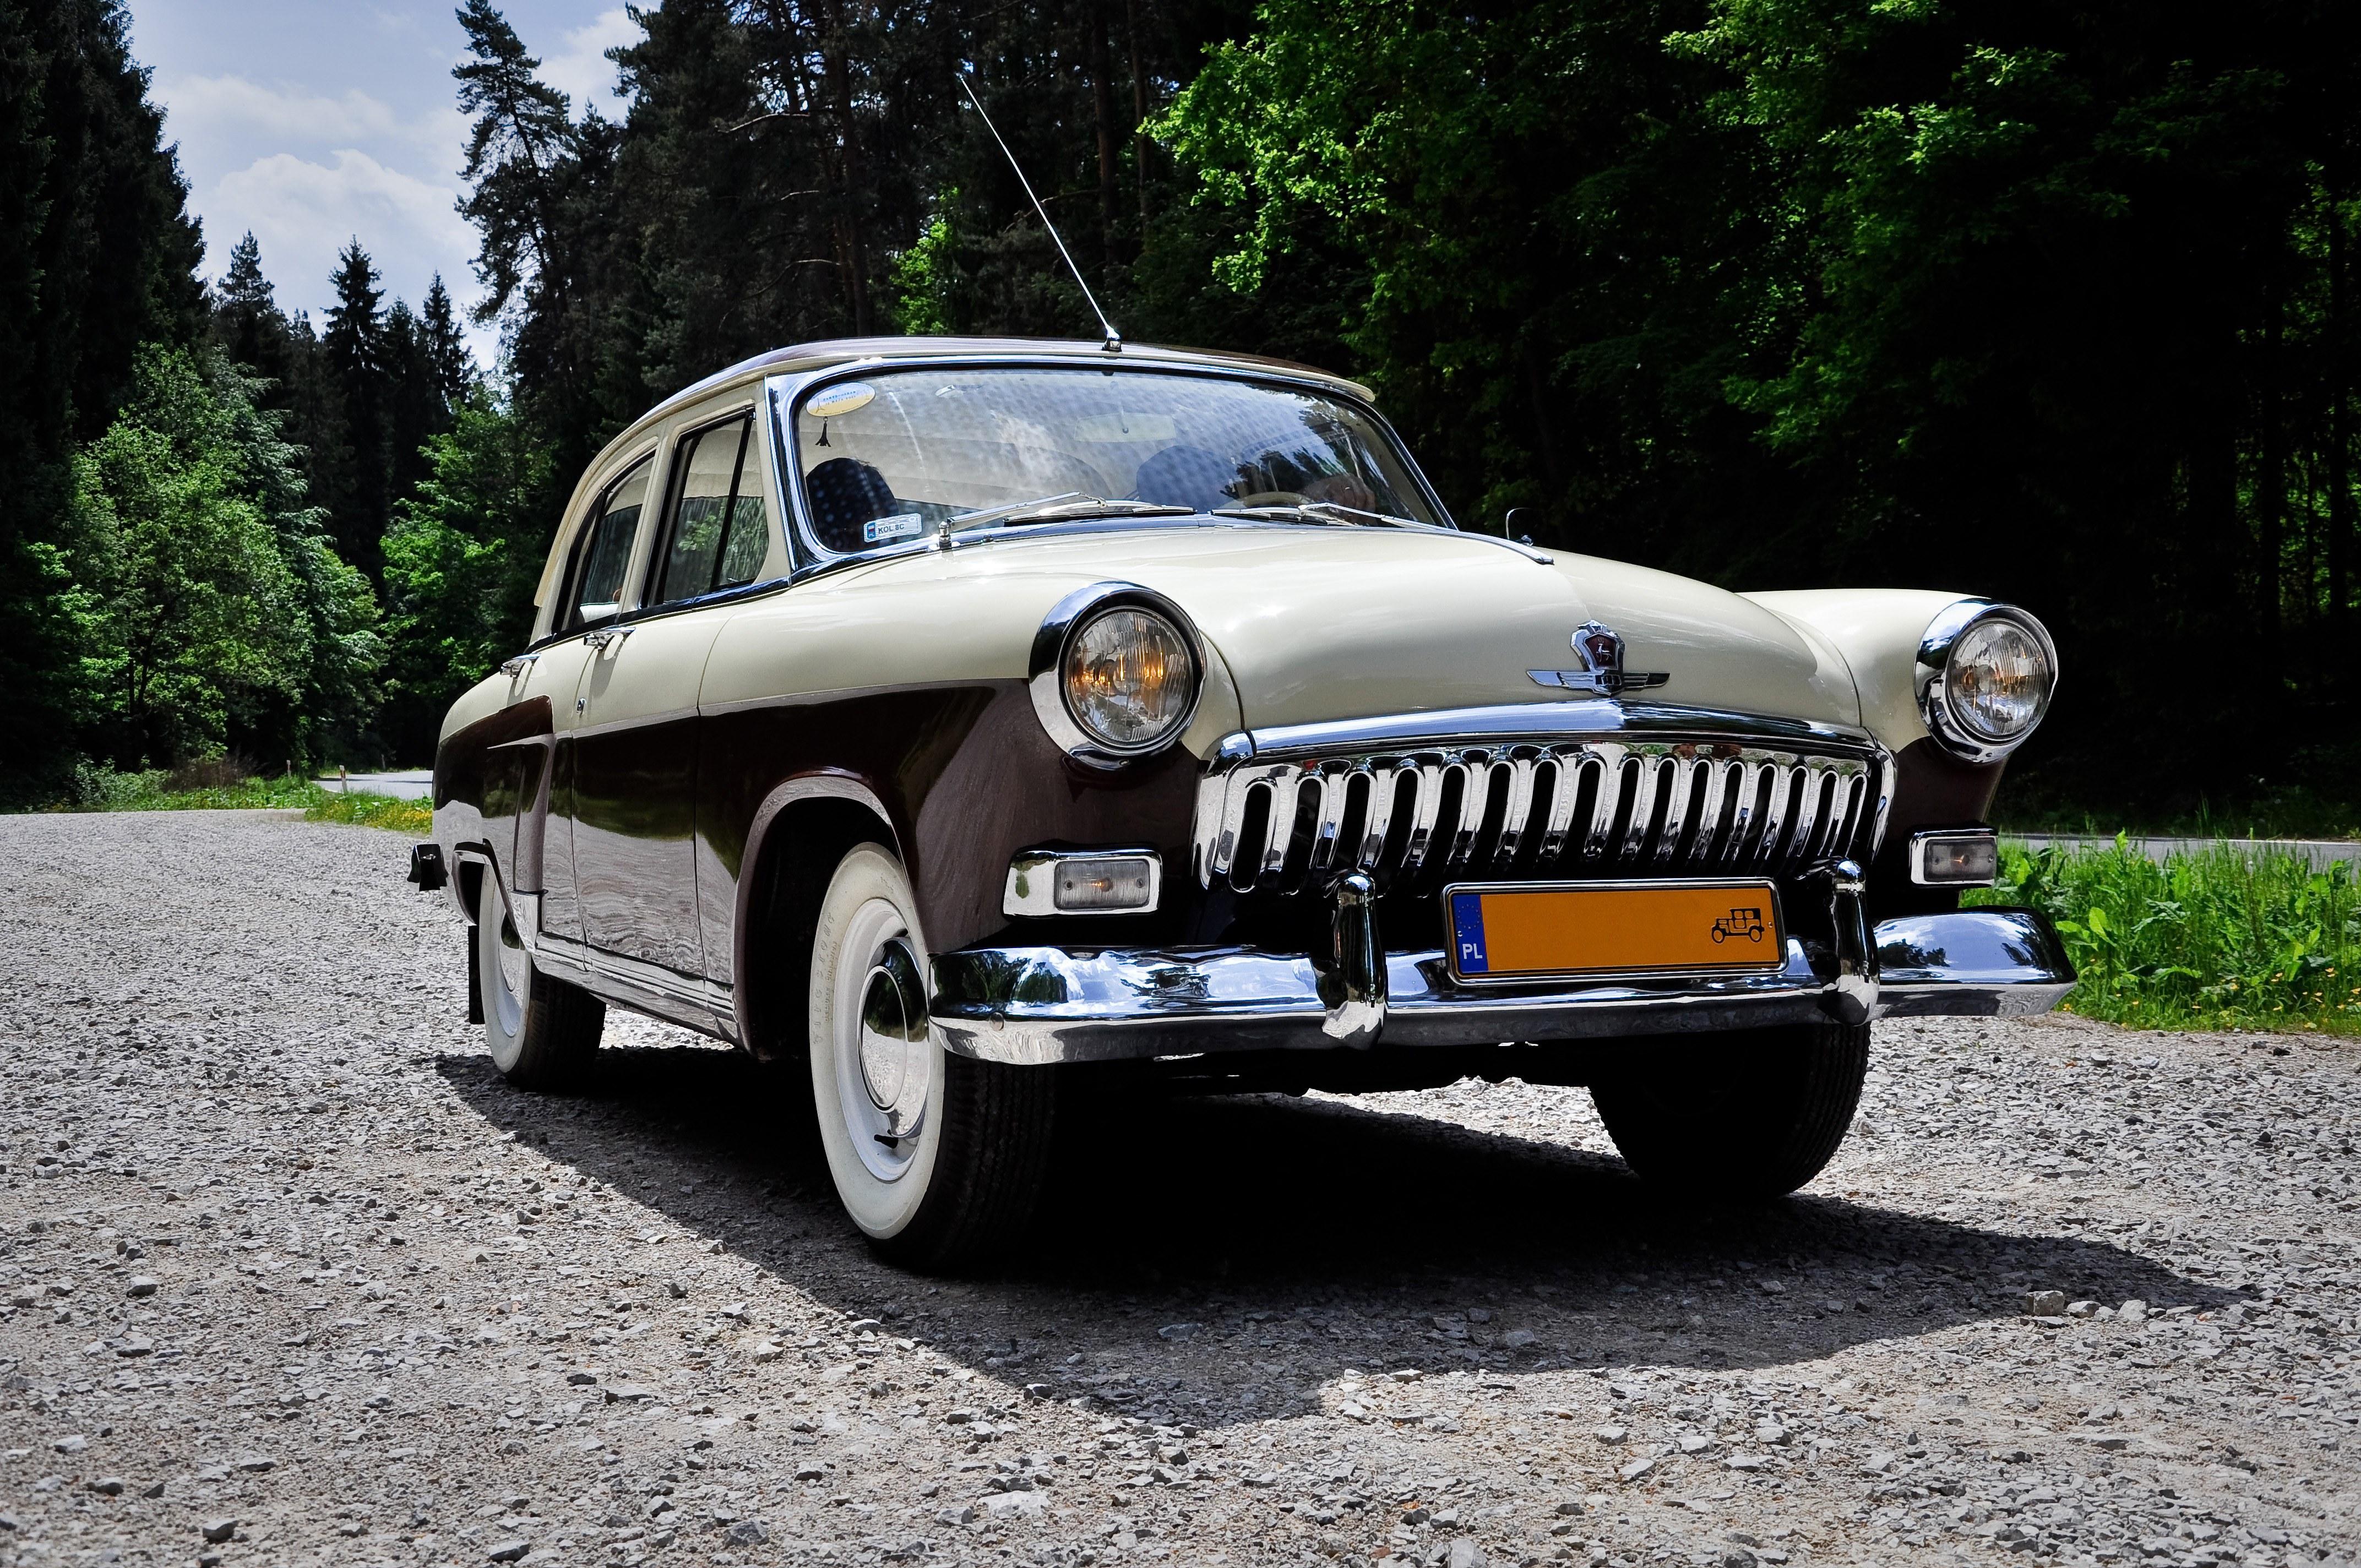 Free Images : old, classic car, motor vehicle, vintage car, sedan ...